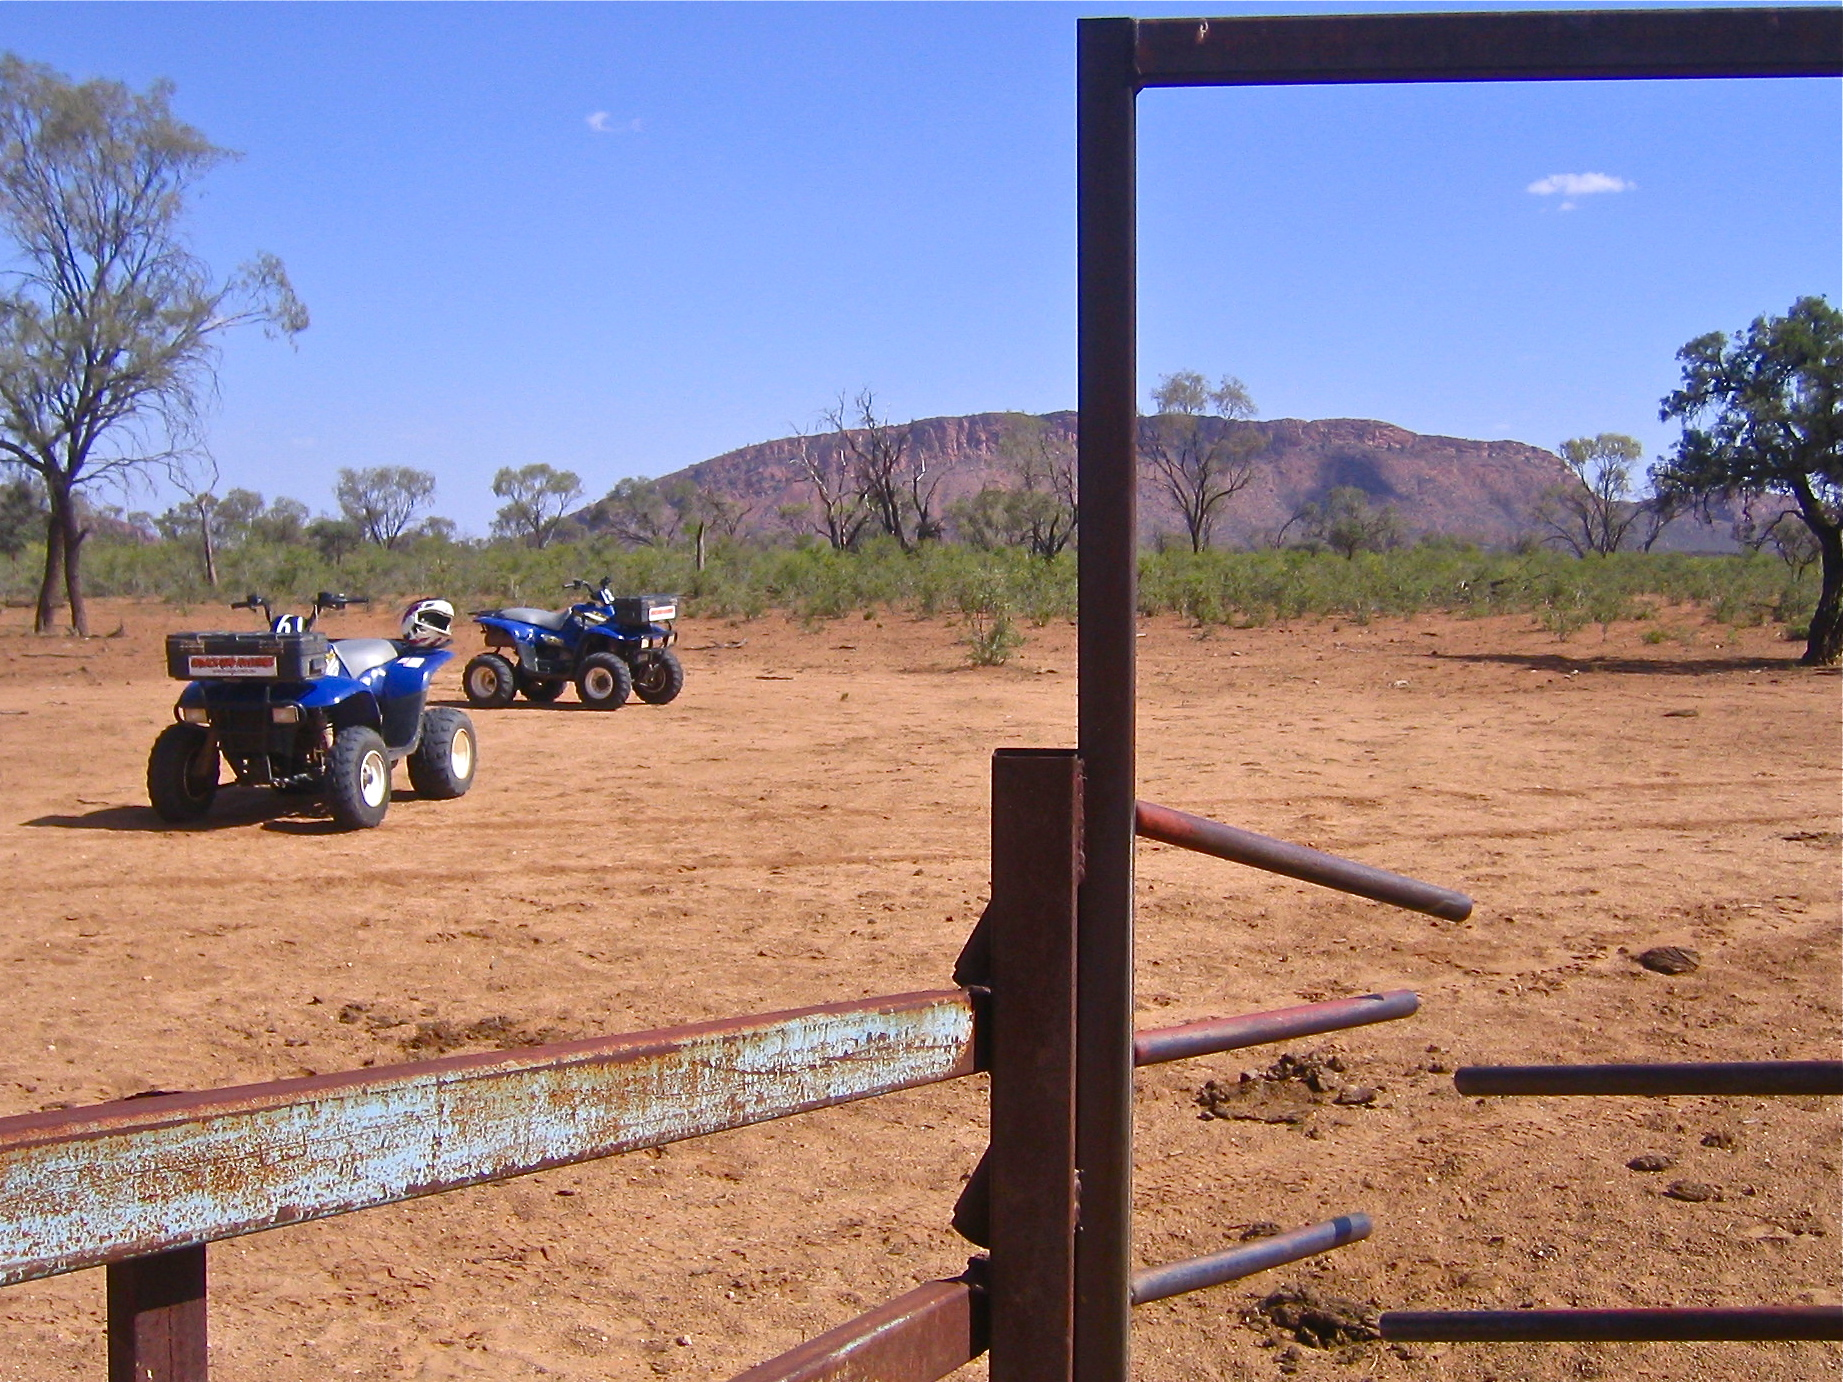 The Australian Outback Australia Alice Springs 4 wheeling aroundtheworldwithjustin.com